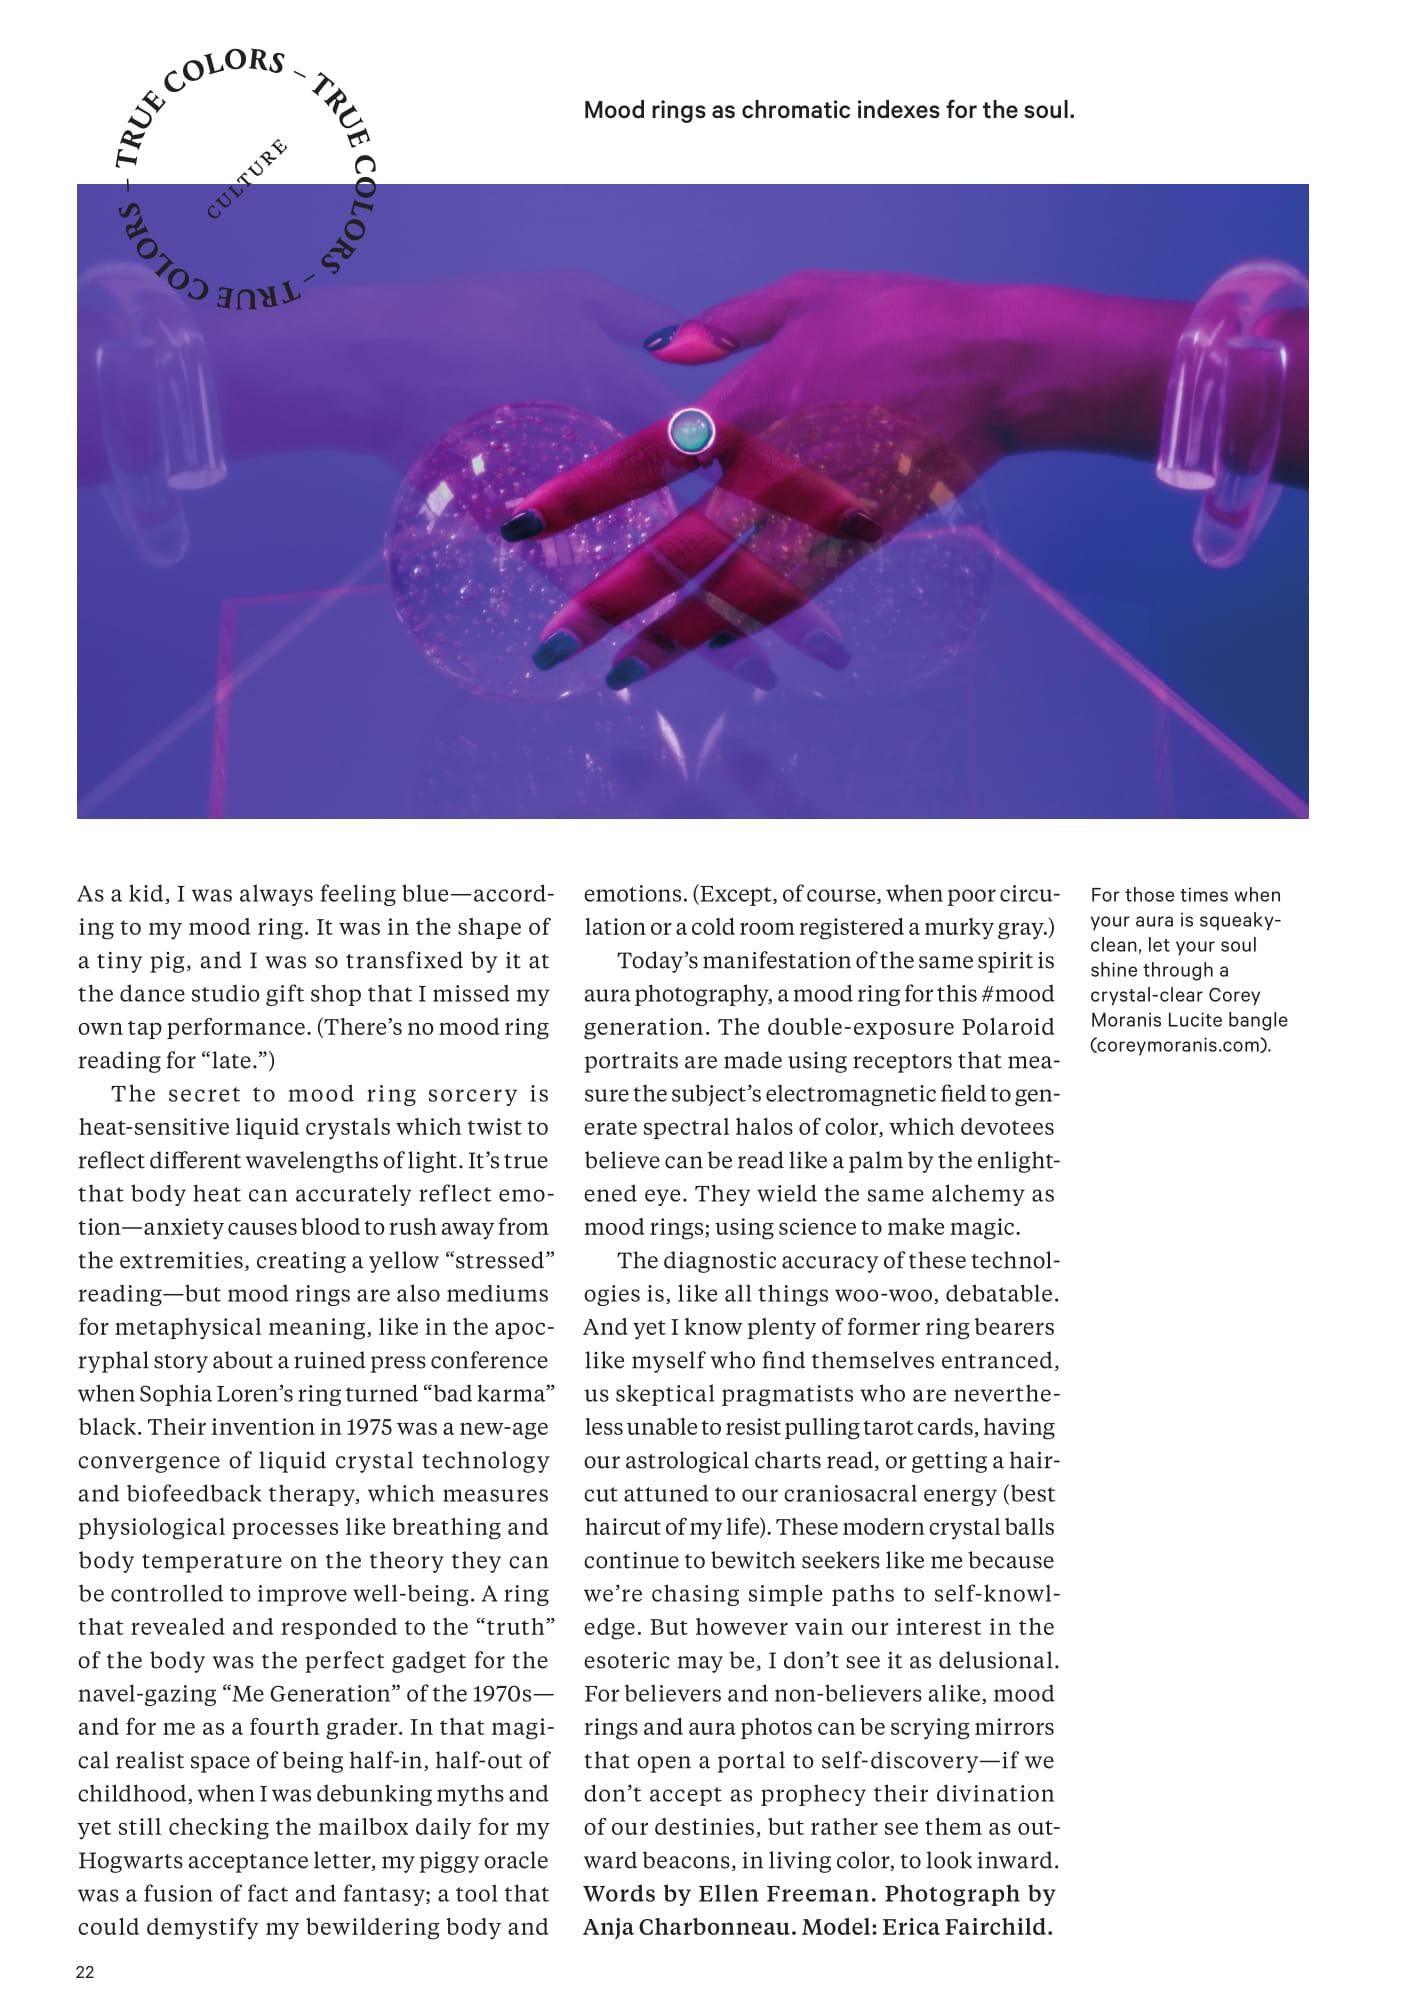 Mood Rings - Ellen Freeman - Broccoli Magazine-1.jpg